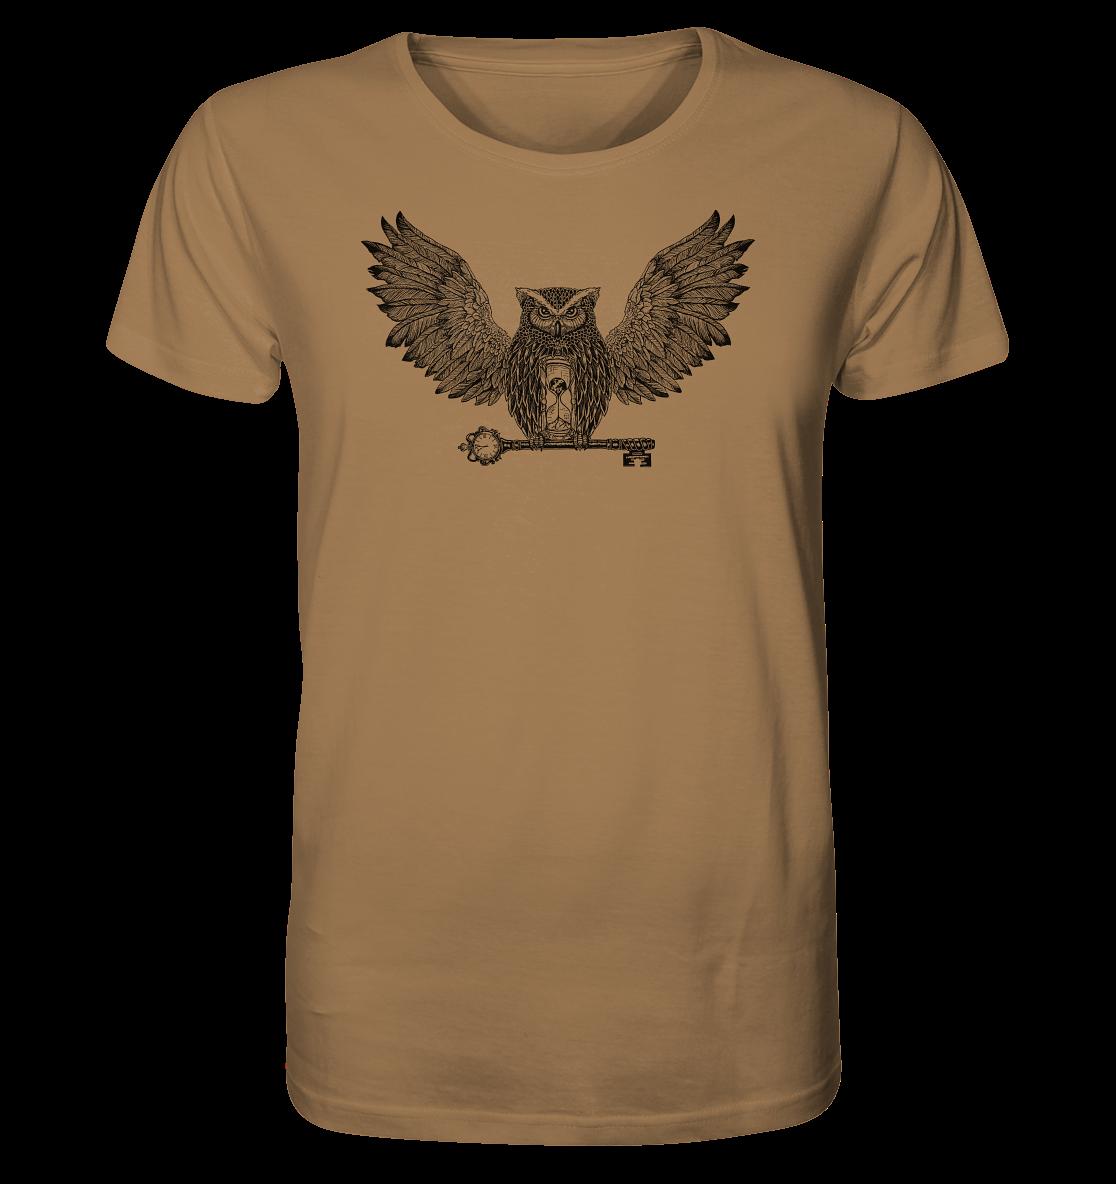 front-organic-shirt-a17c55-1116x-9.png